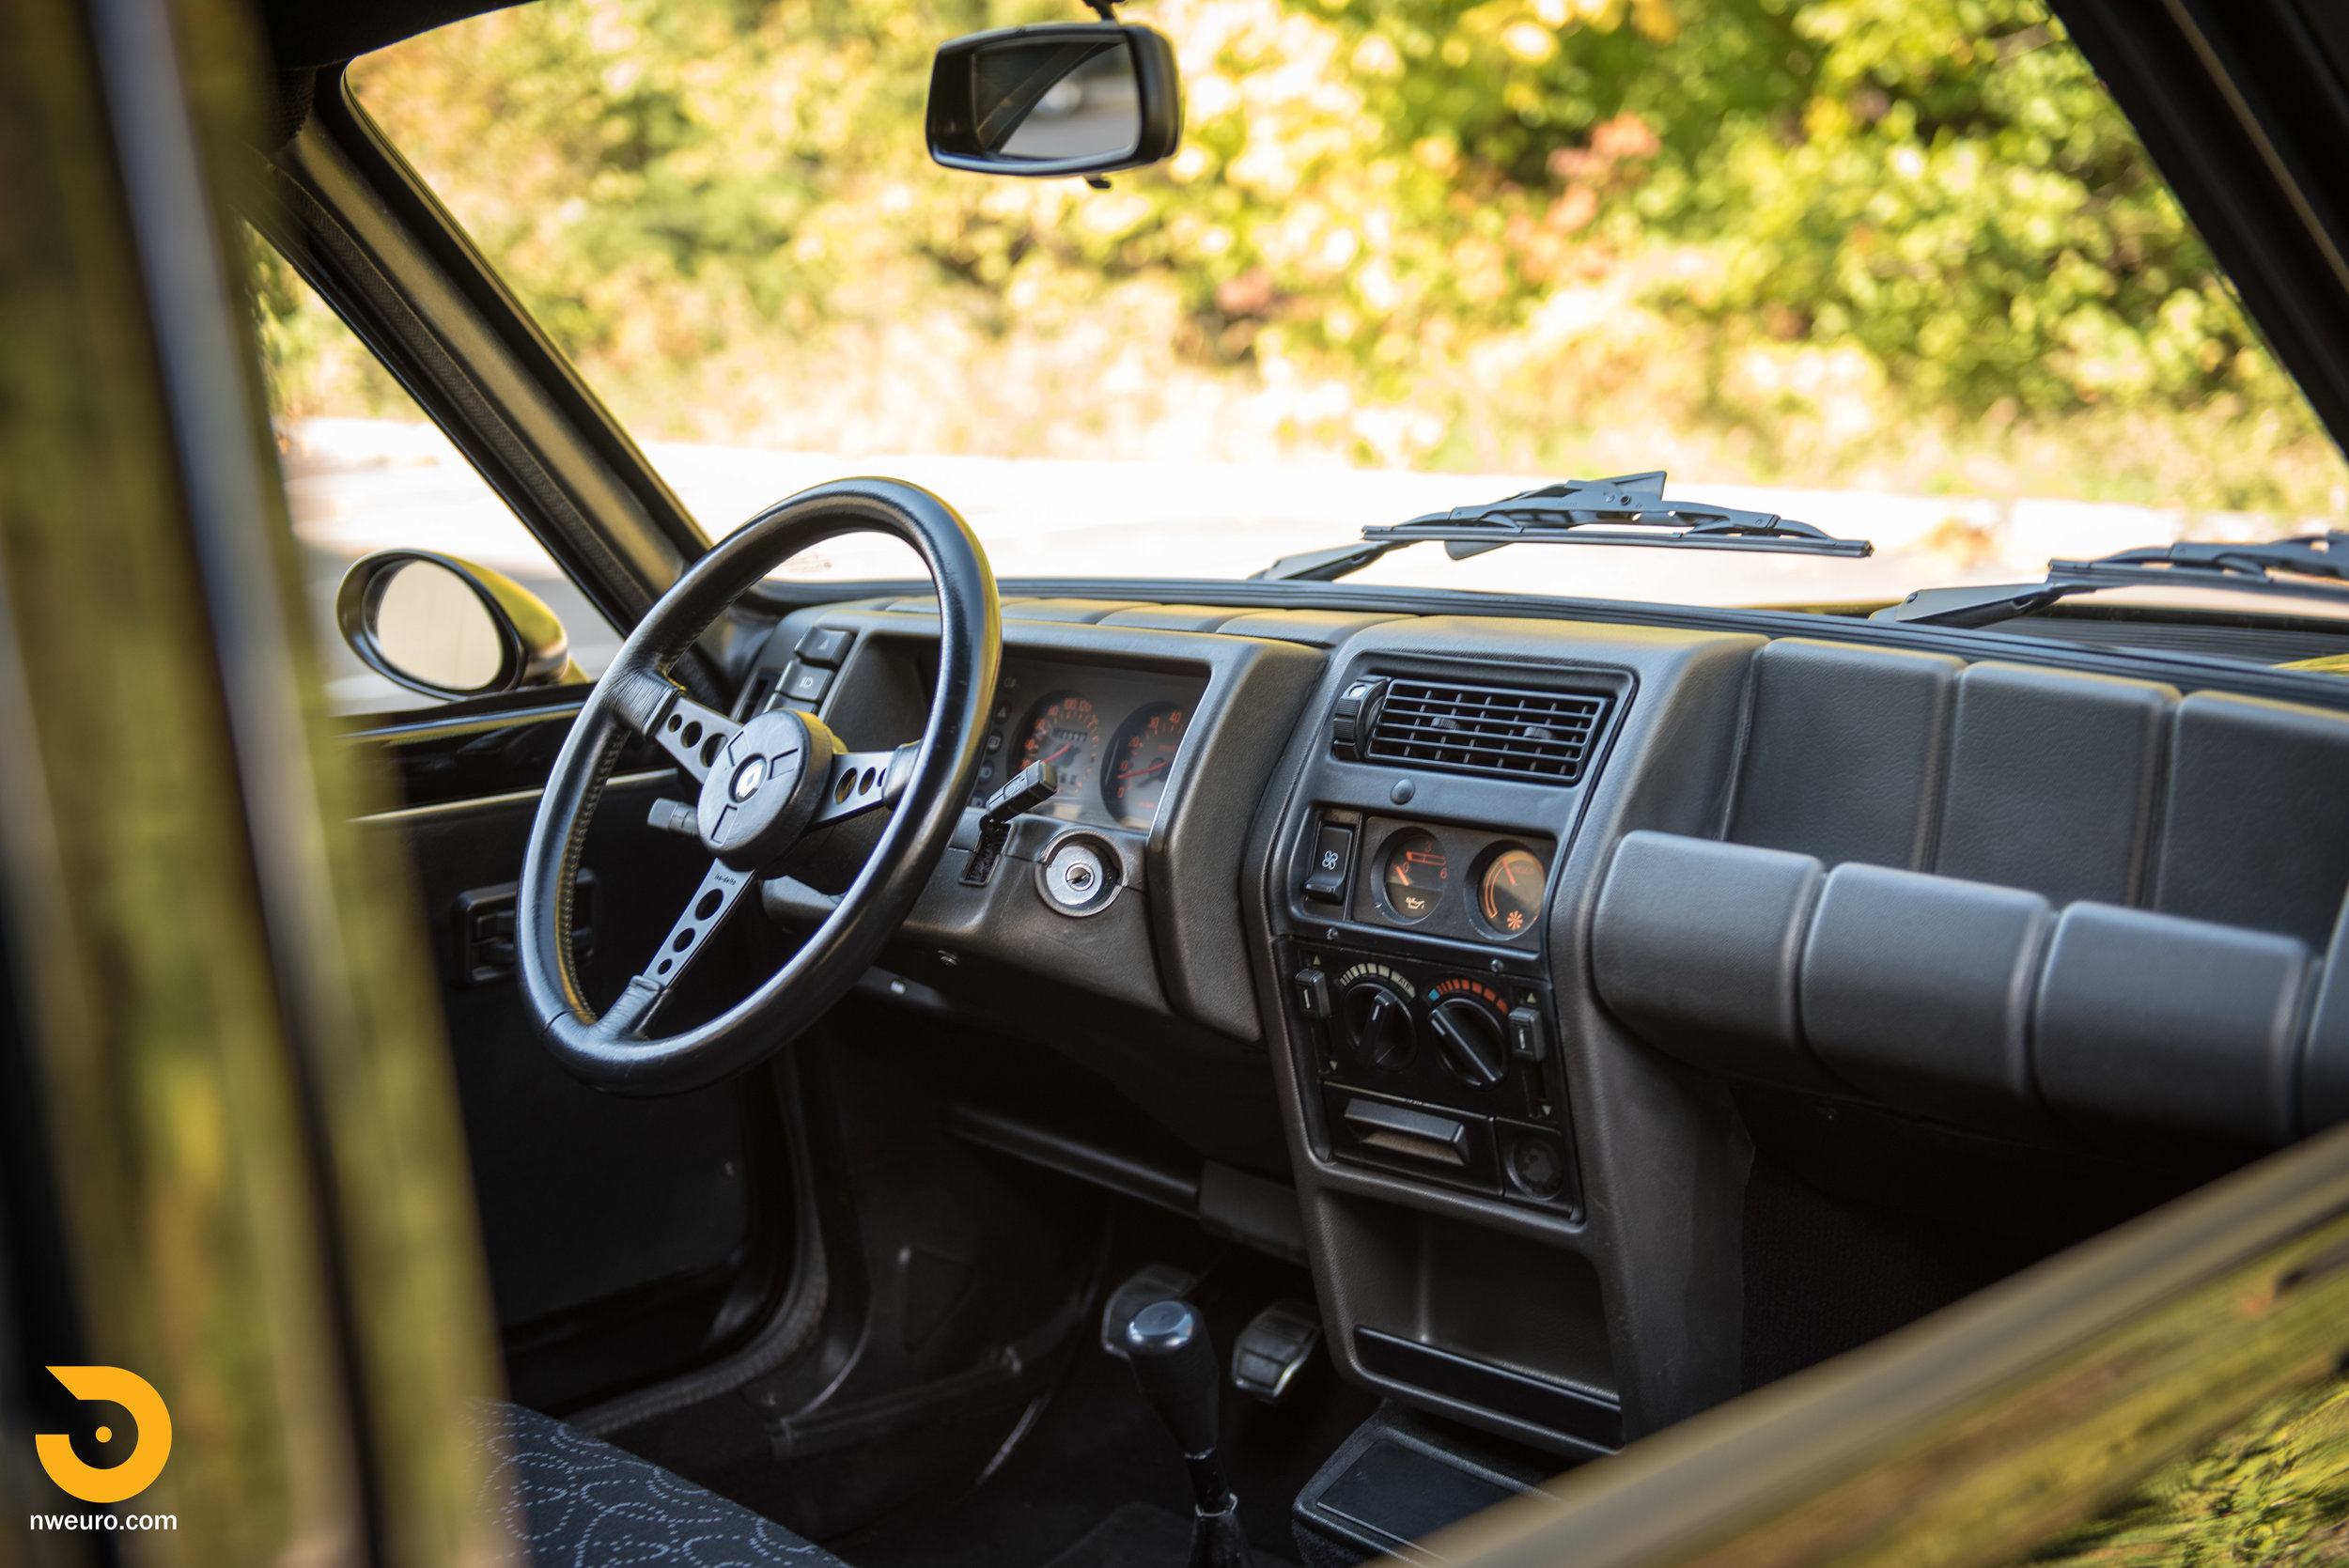 1983 Renault R5 Turbo 2 Black-61.jpg